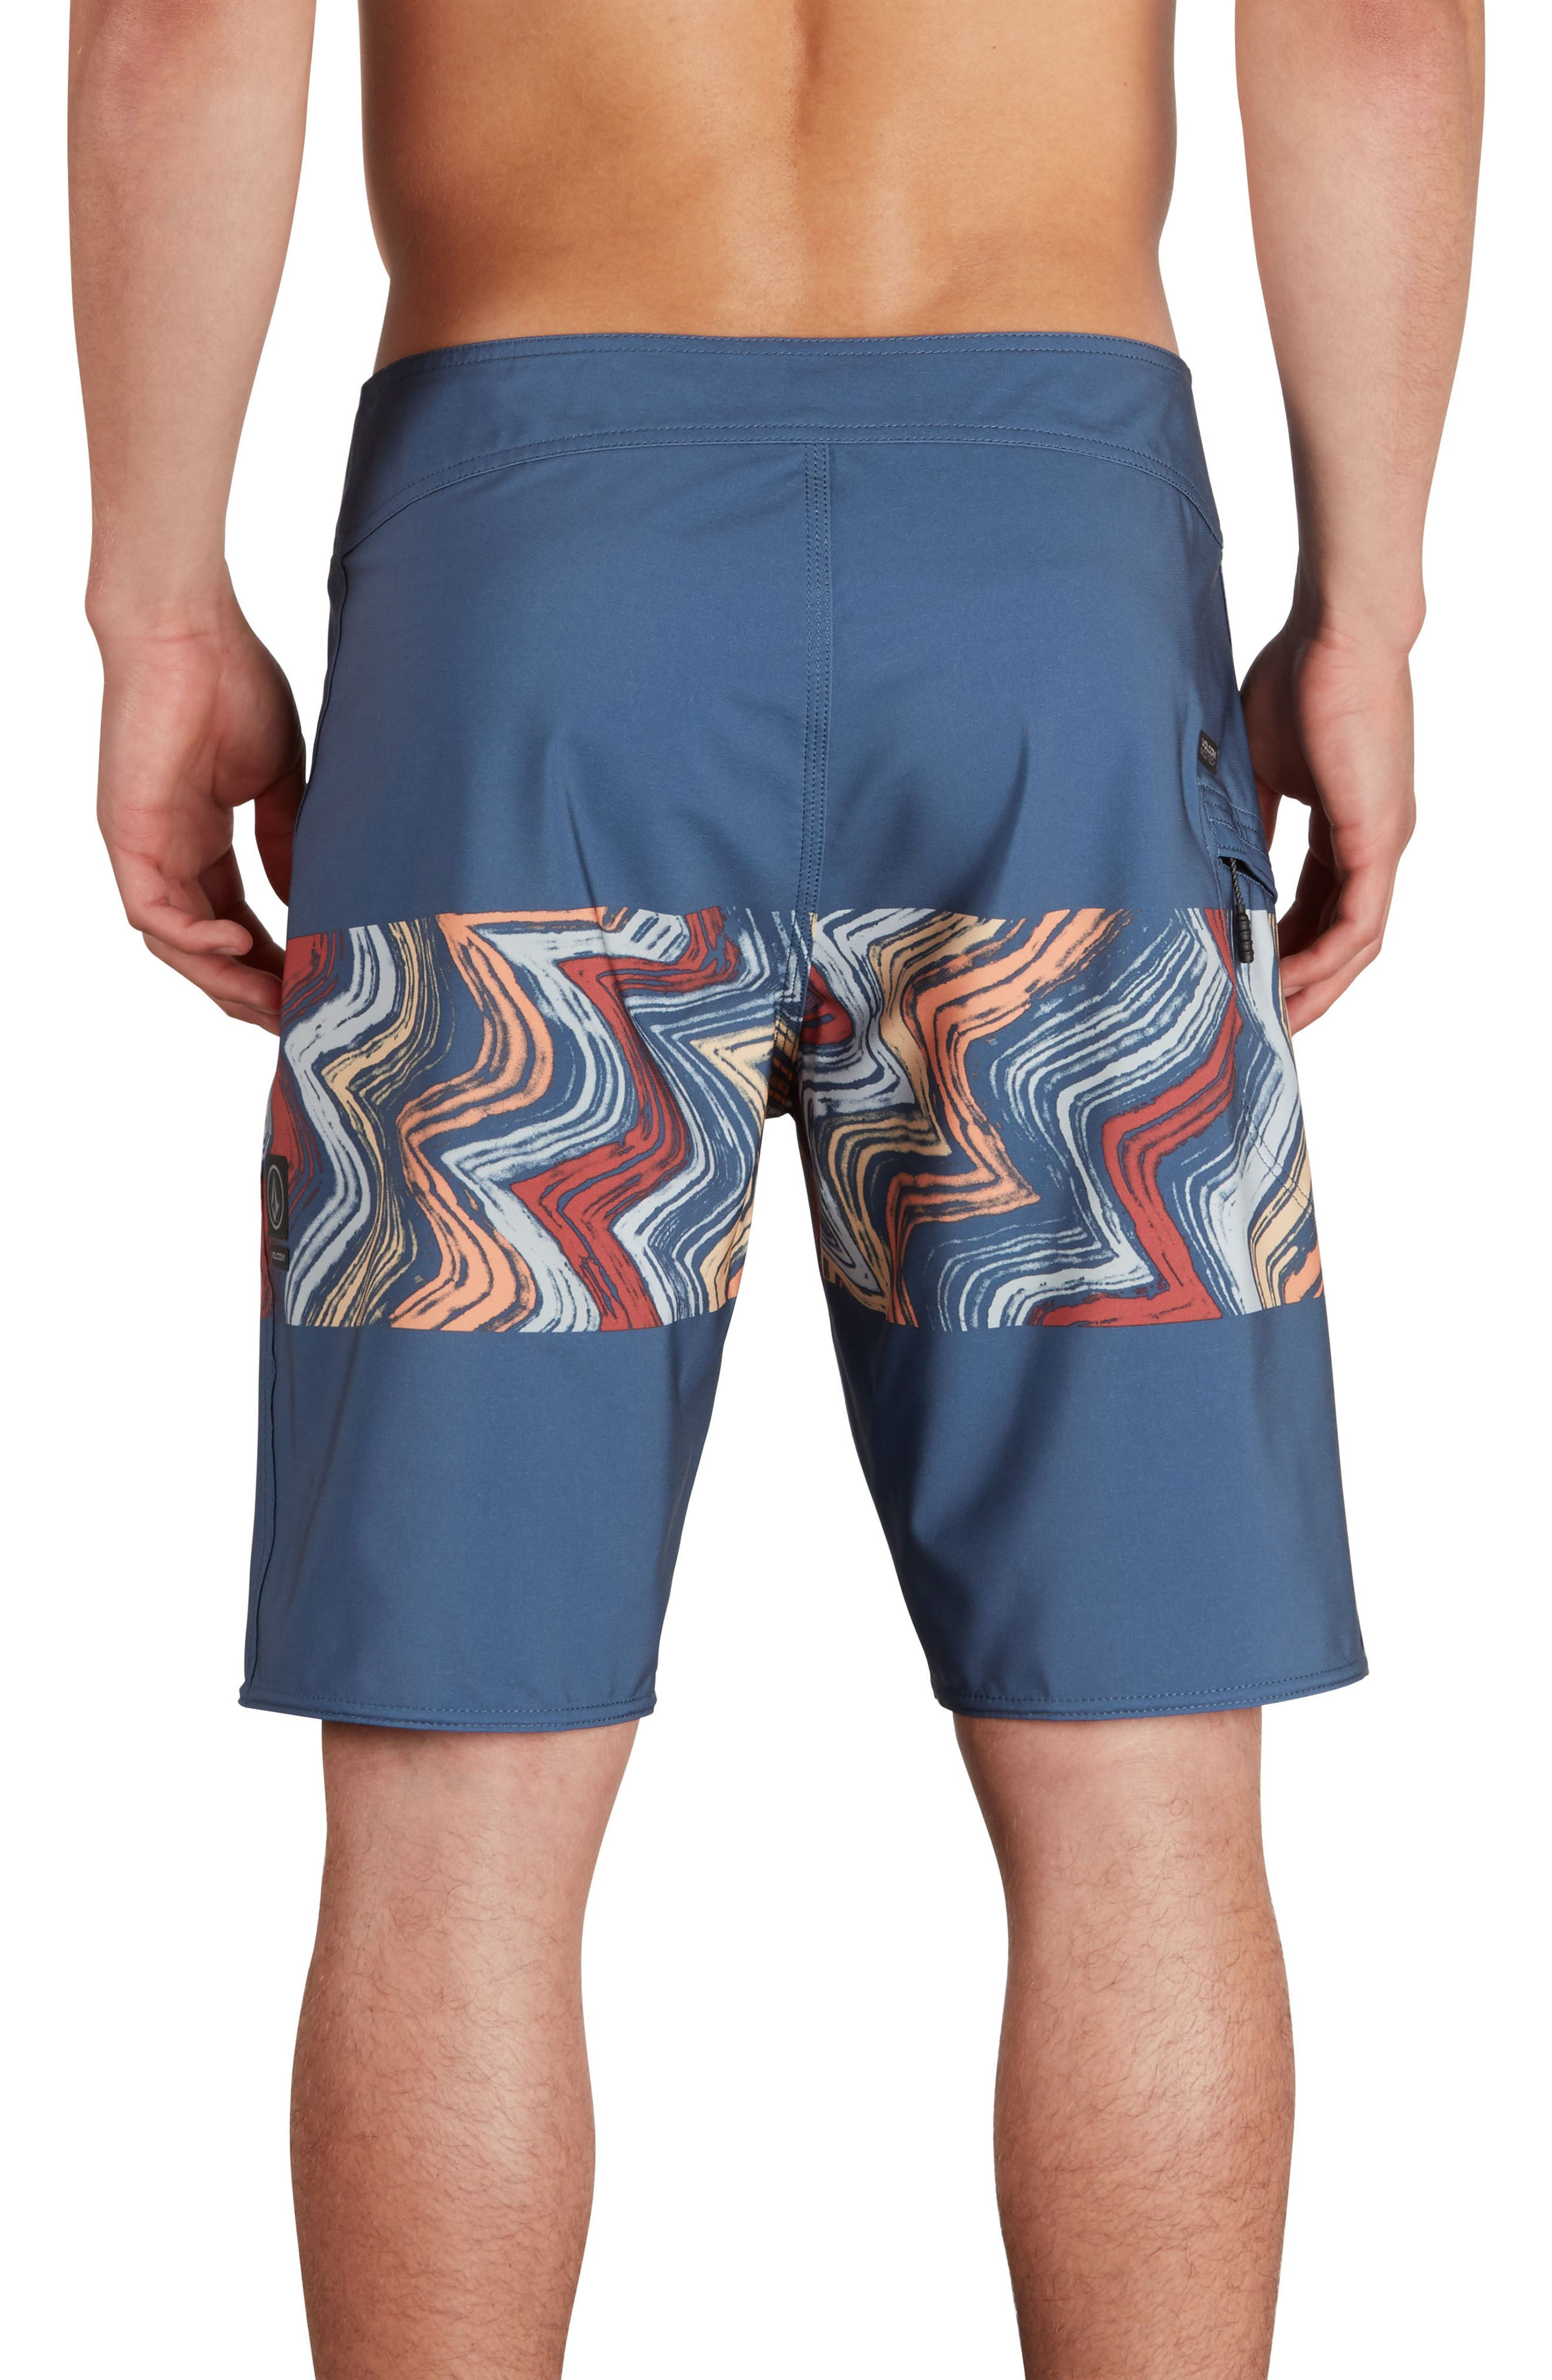 Macaw Mod Board Shorts,                             Alternate thumbnail 2, color,                             Sunburst